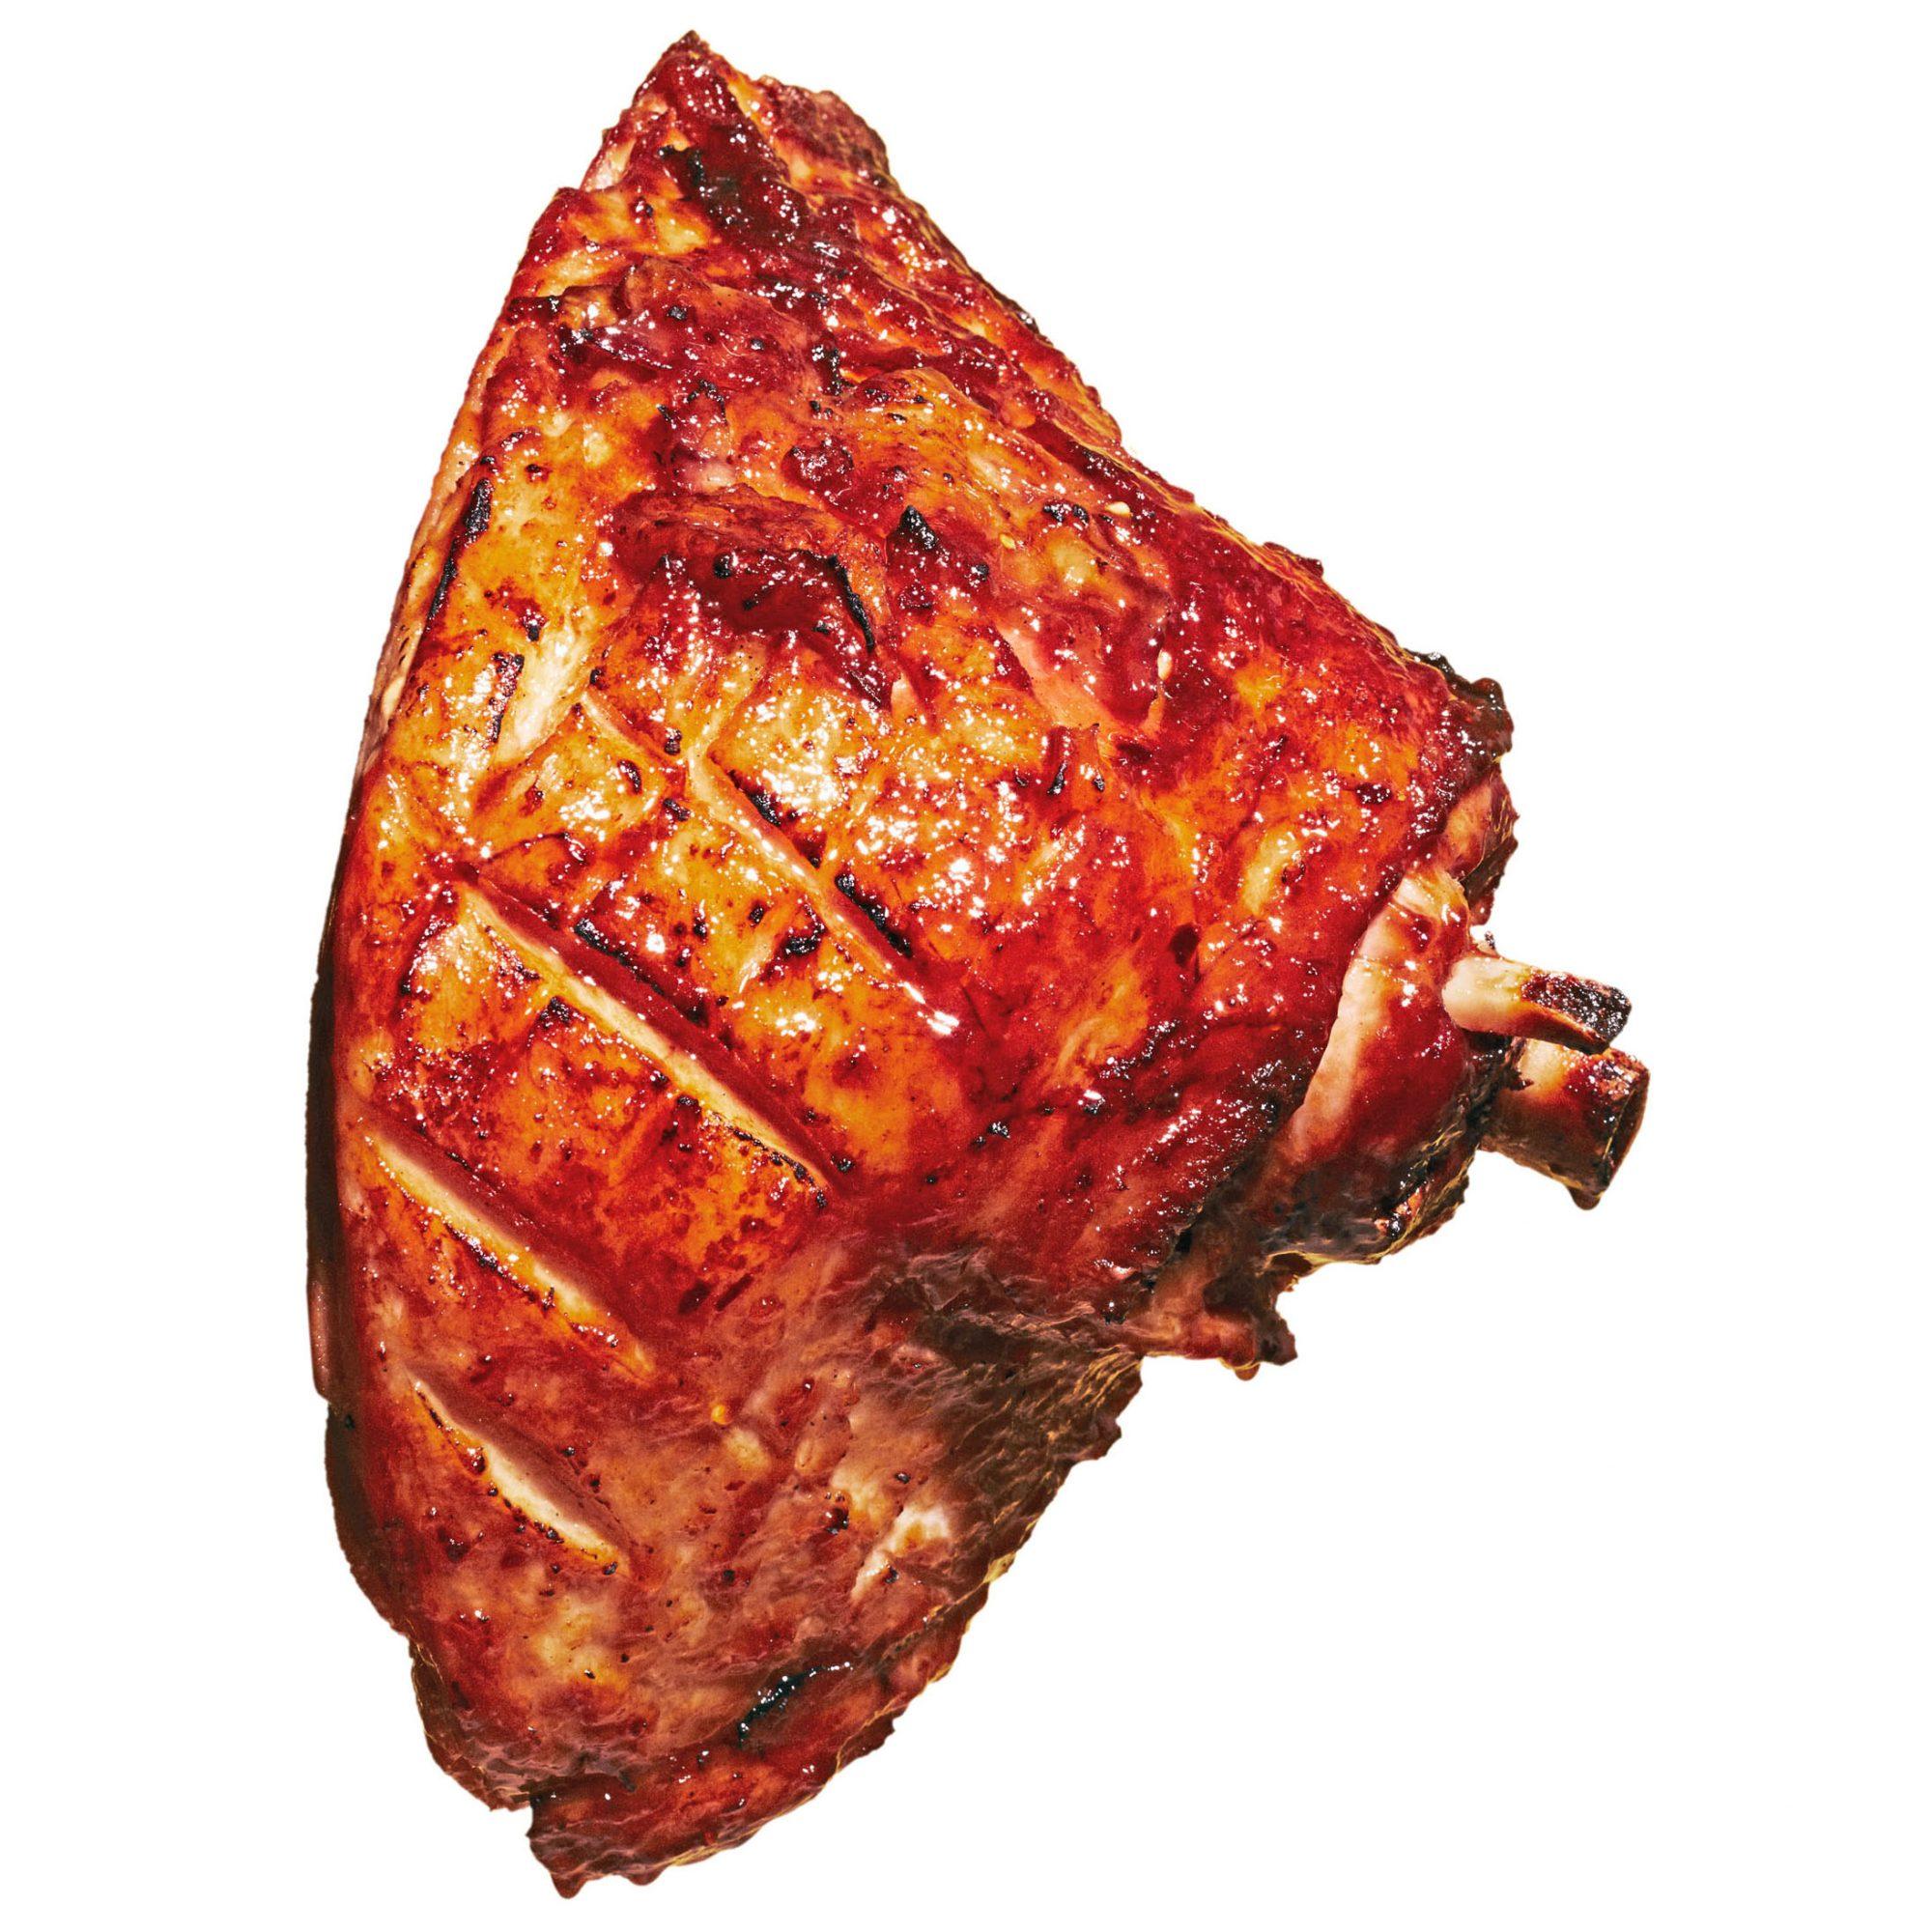 Stout-Brined Rack of Pork